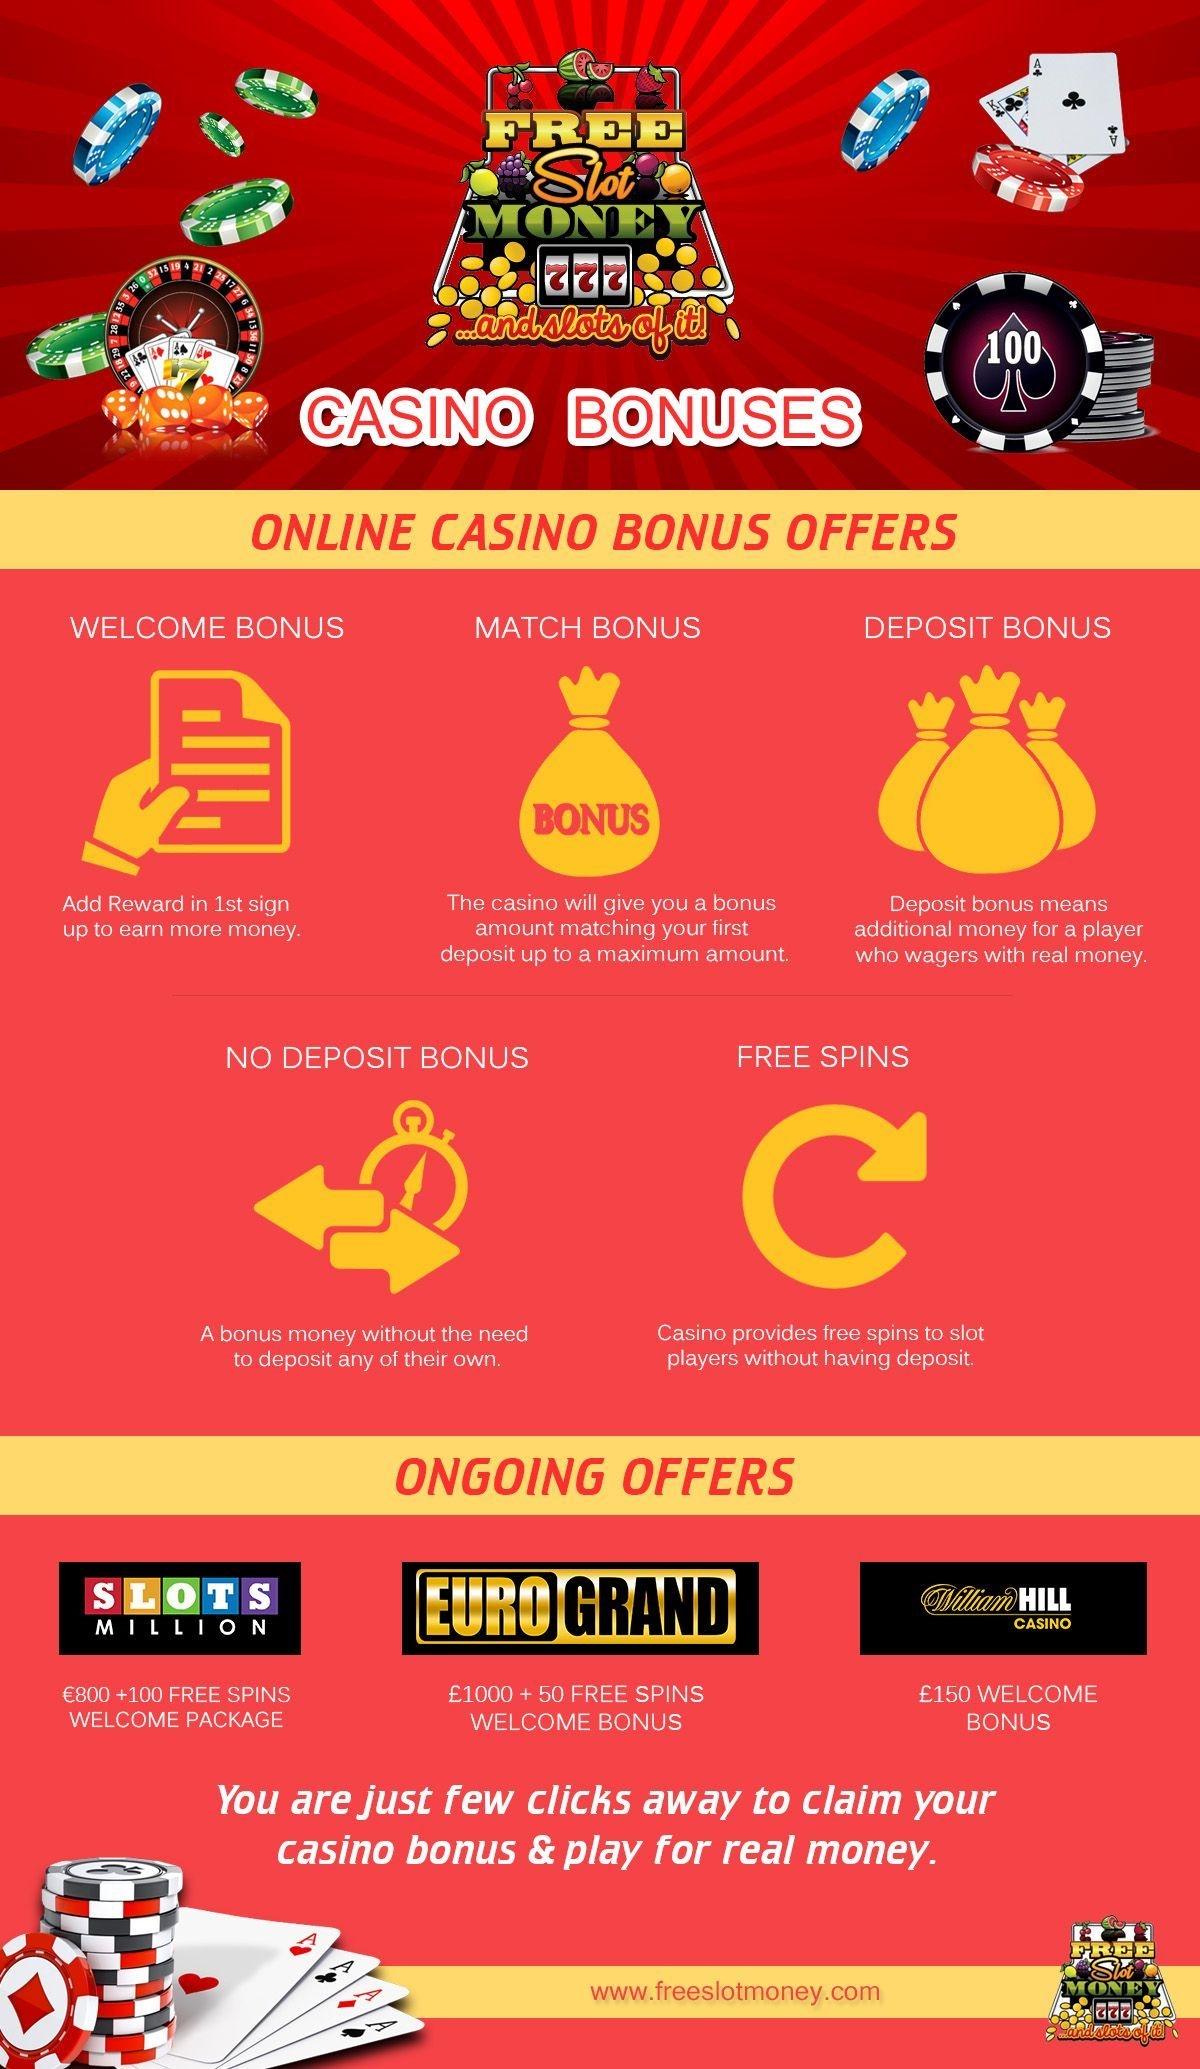 77 gratis Spin-Kasino am 888 Casino